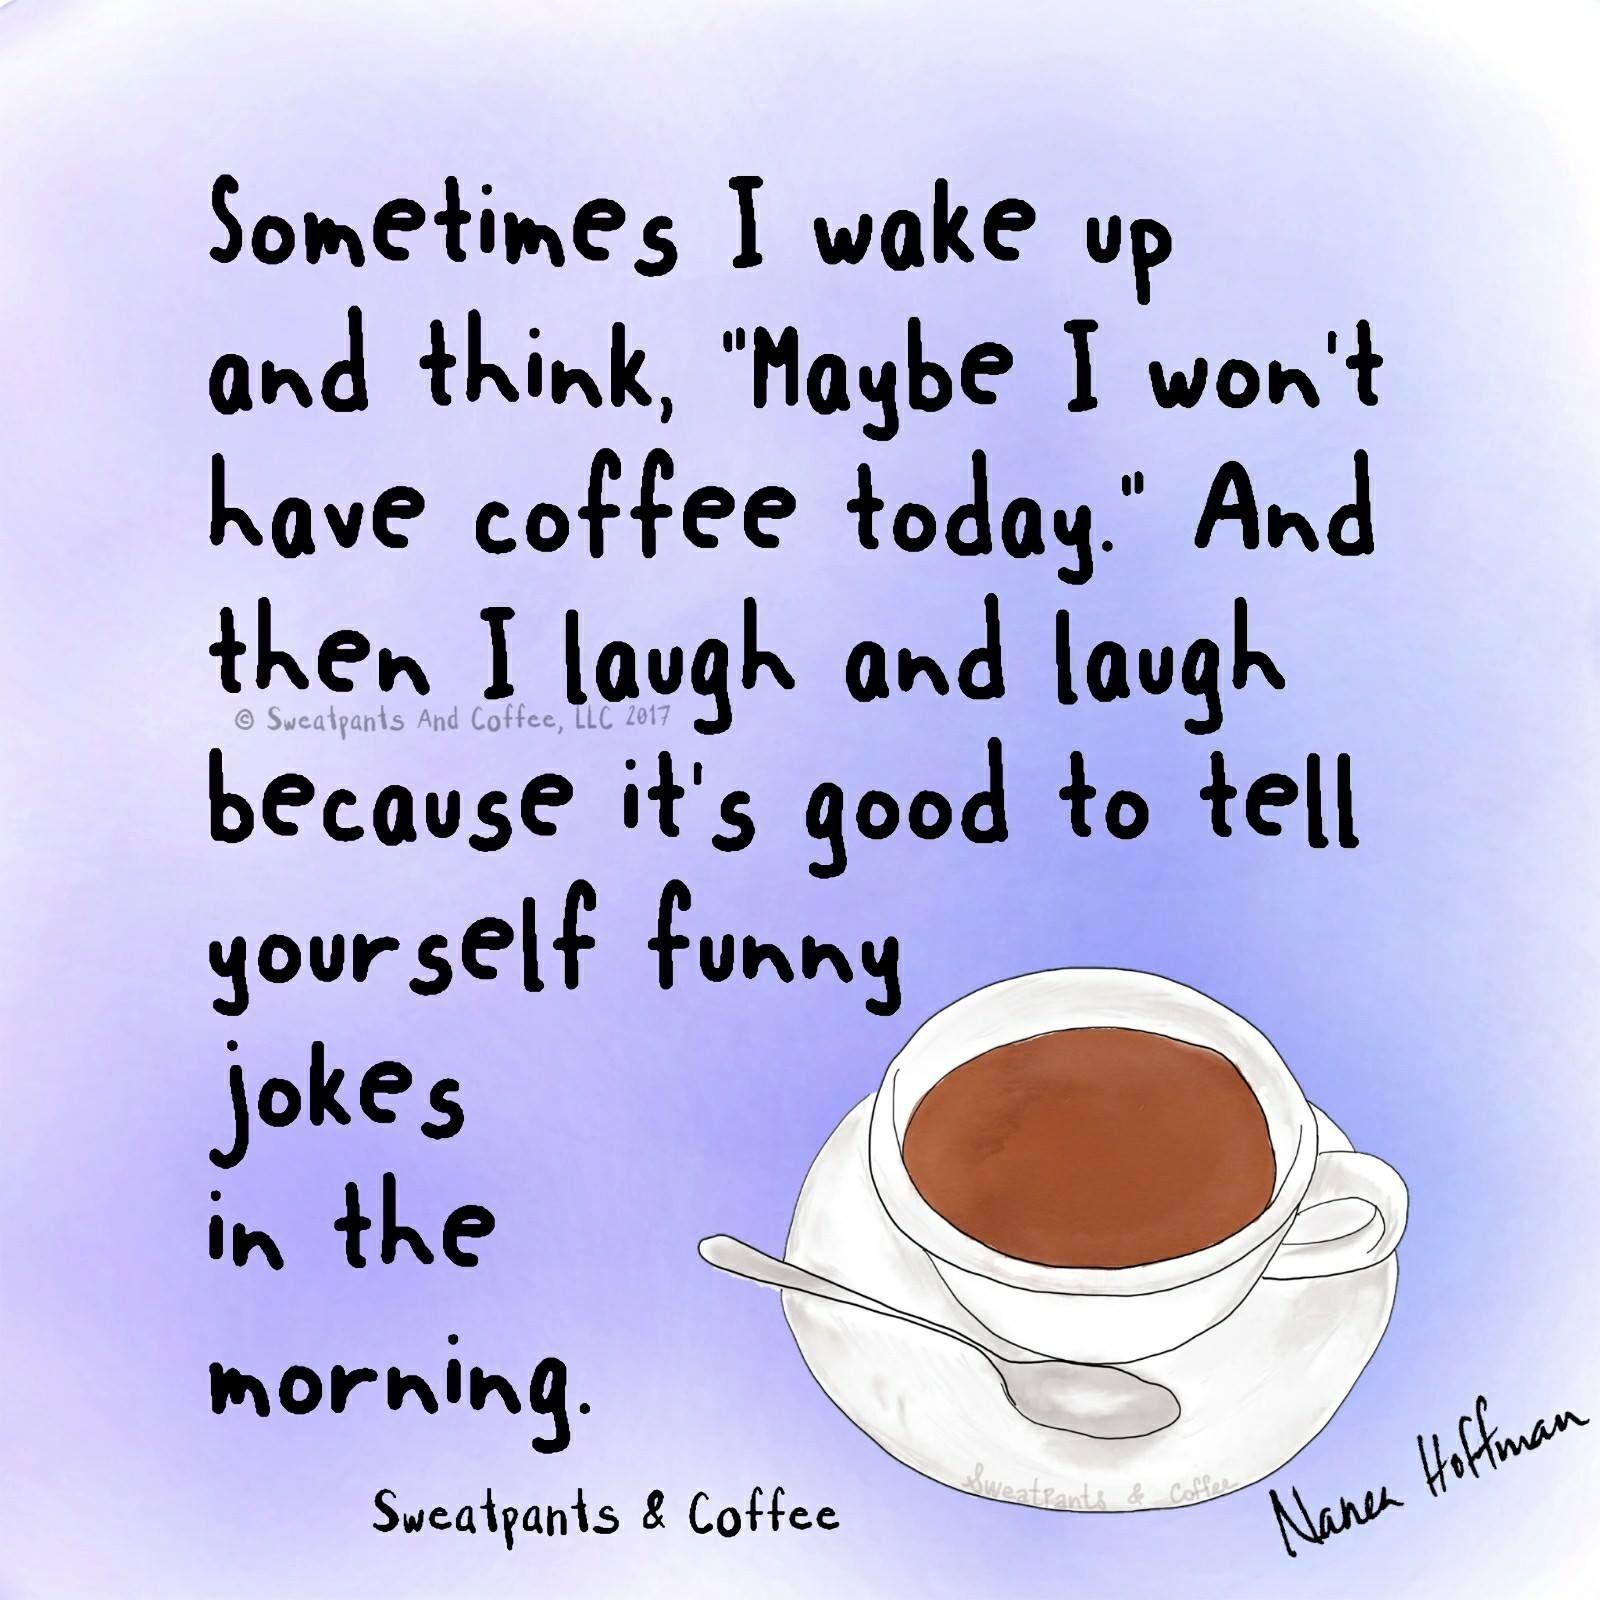 Coffee joke #CoffeeHumor #CoffeeQuotes | Coffee | Coffee ...